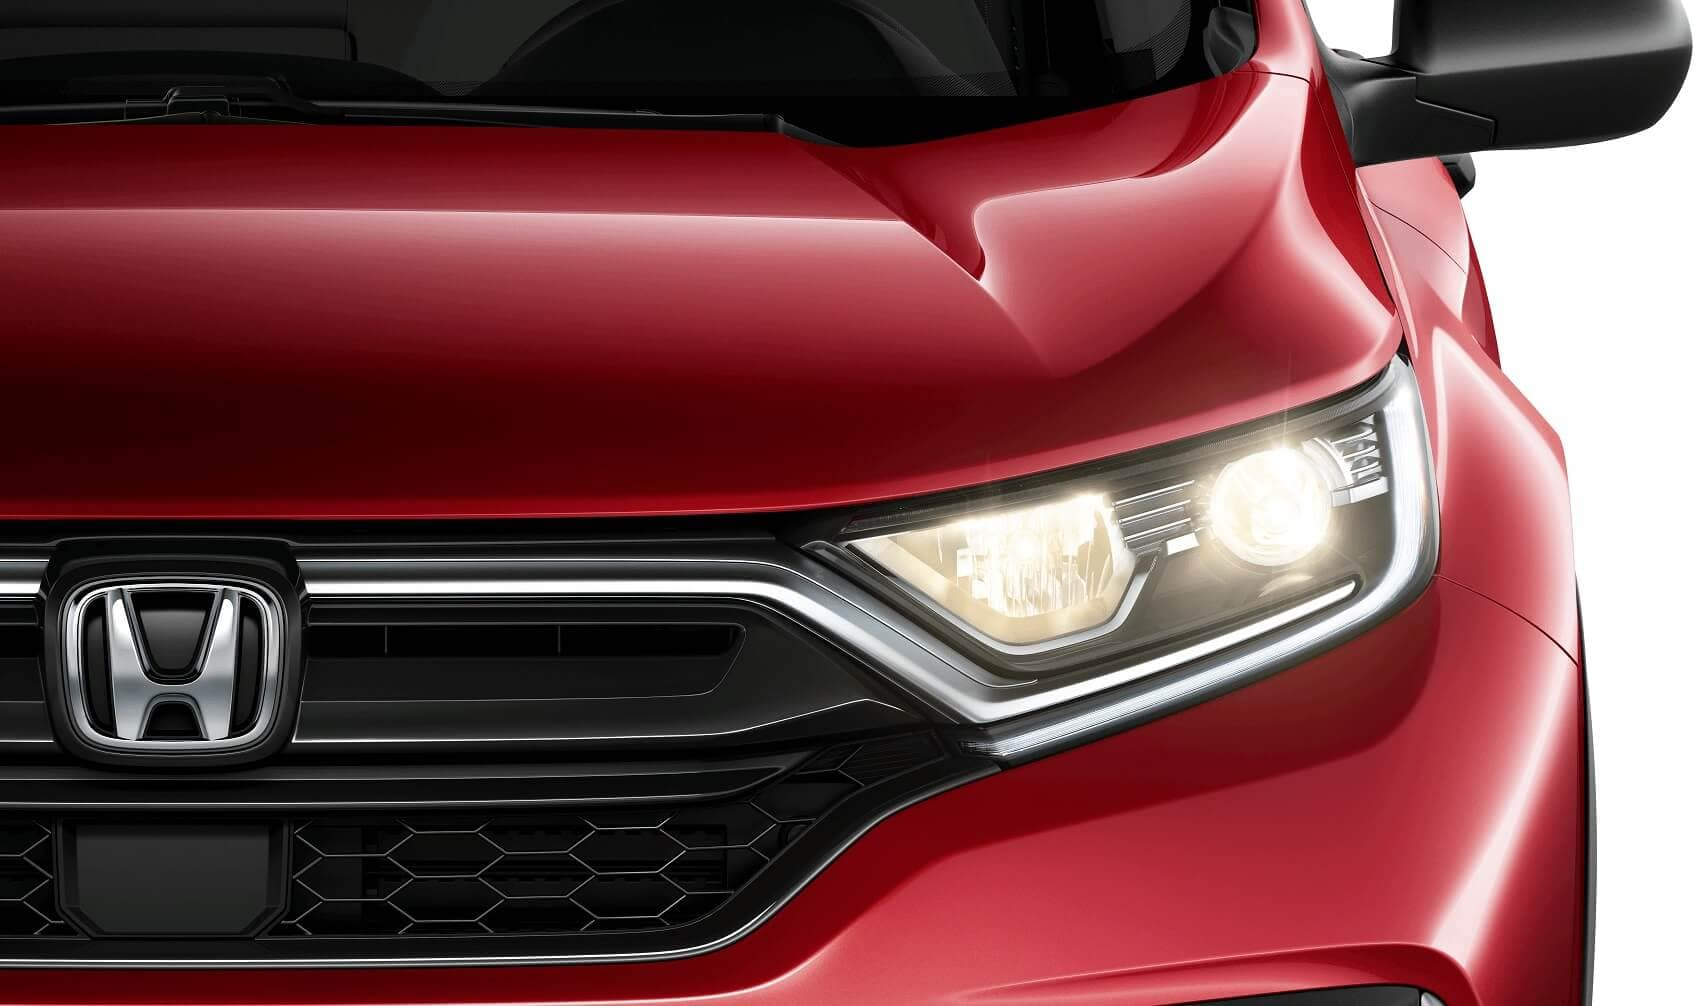 2020 Honda CR-V Engine Specs